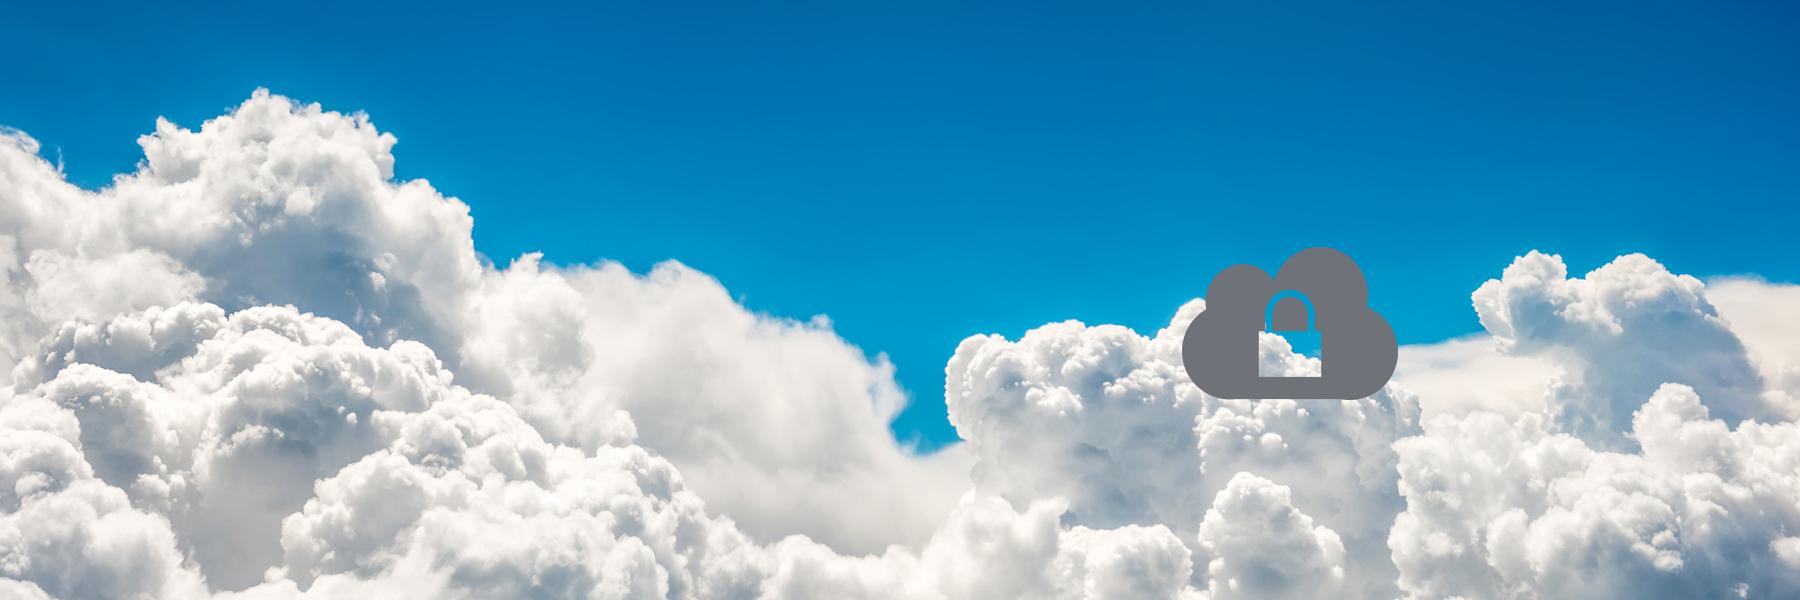 headergrafik-cloud-storage.png